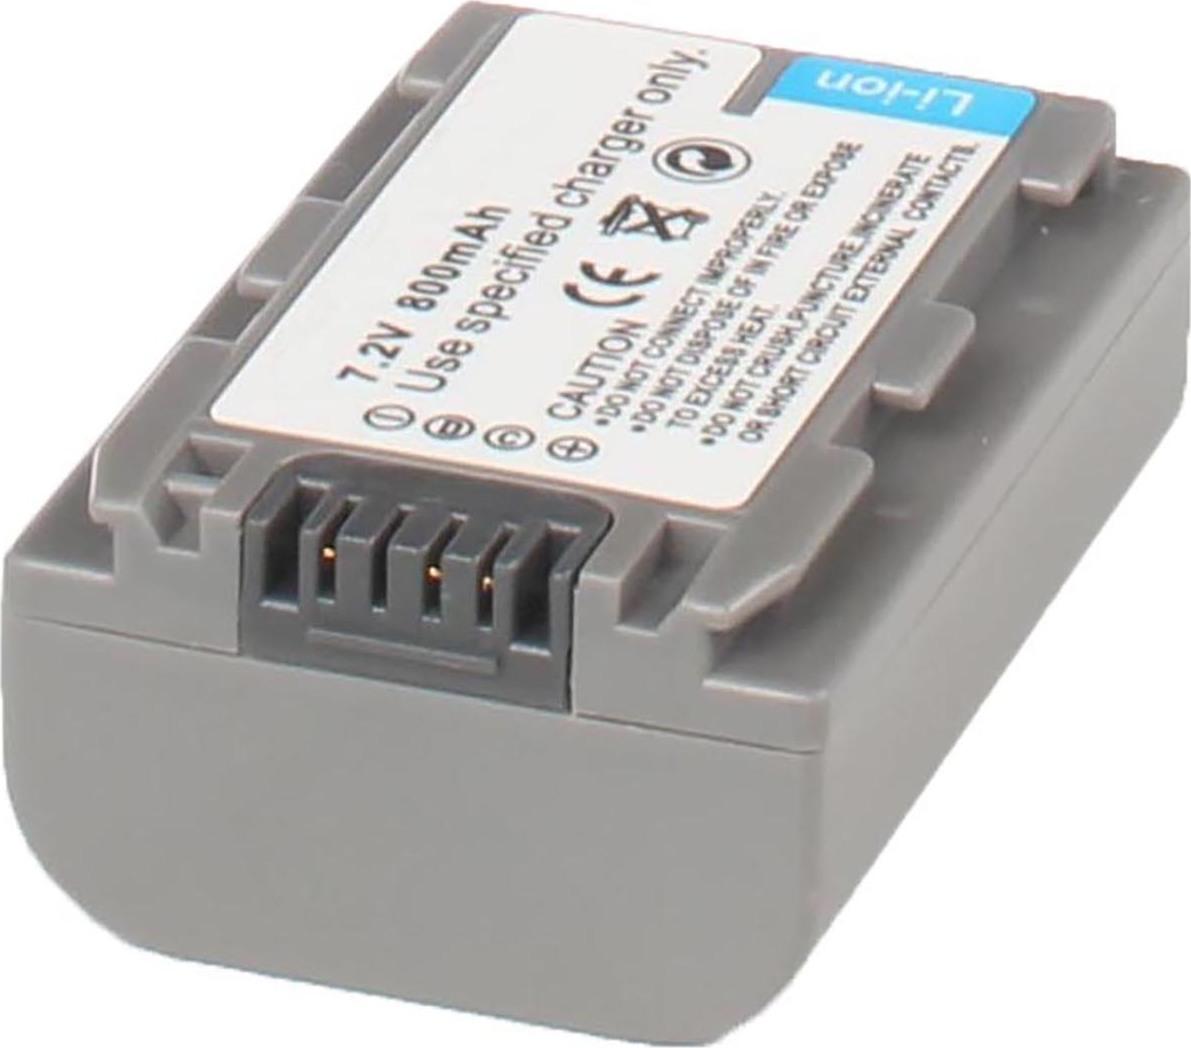 Аккумуляторная батарея iBatt iB-T1-F280 750mAh для камер Sony HDR-HC3, DCR-SR60, DCR-HC23E, DCR-HC17E, DCR-HC26E, DCR-HC35E, DCR-HC30E, DCR-HC96E, DCR-HC18E, DCR-HC32E, DCR-HC19E, DCR-DVD105E, DCR-HC46E, DCR-HC42E, DCR-DVD405E, DCR-HC96, DCR-HC26,